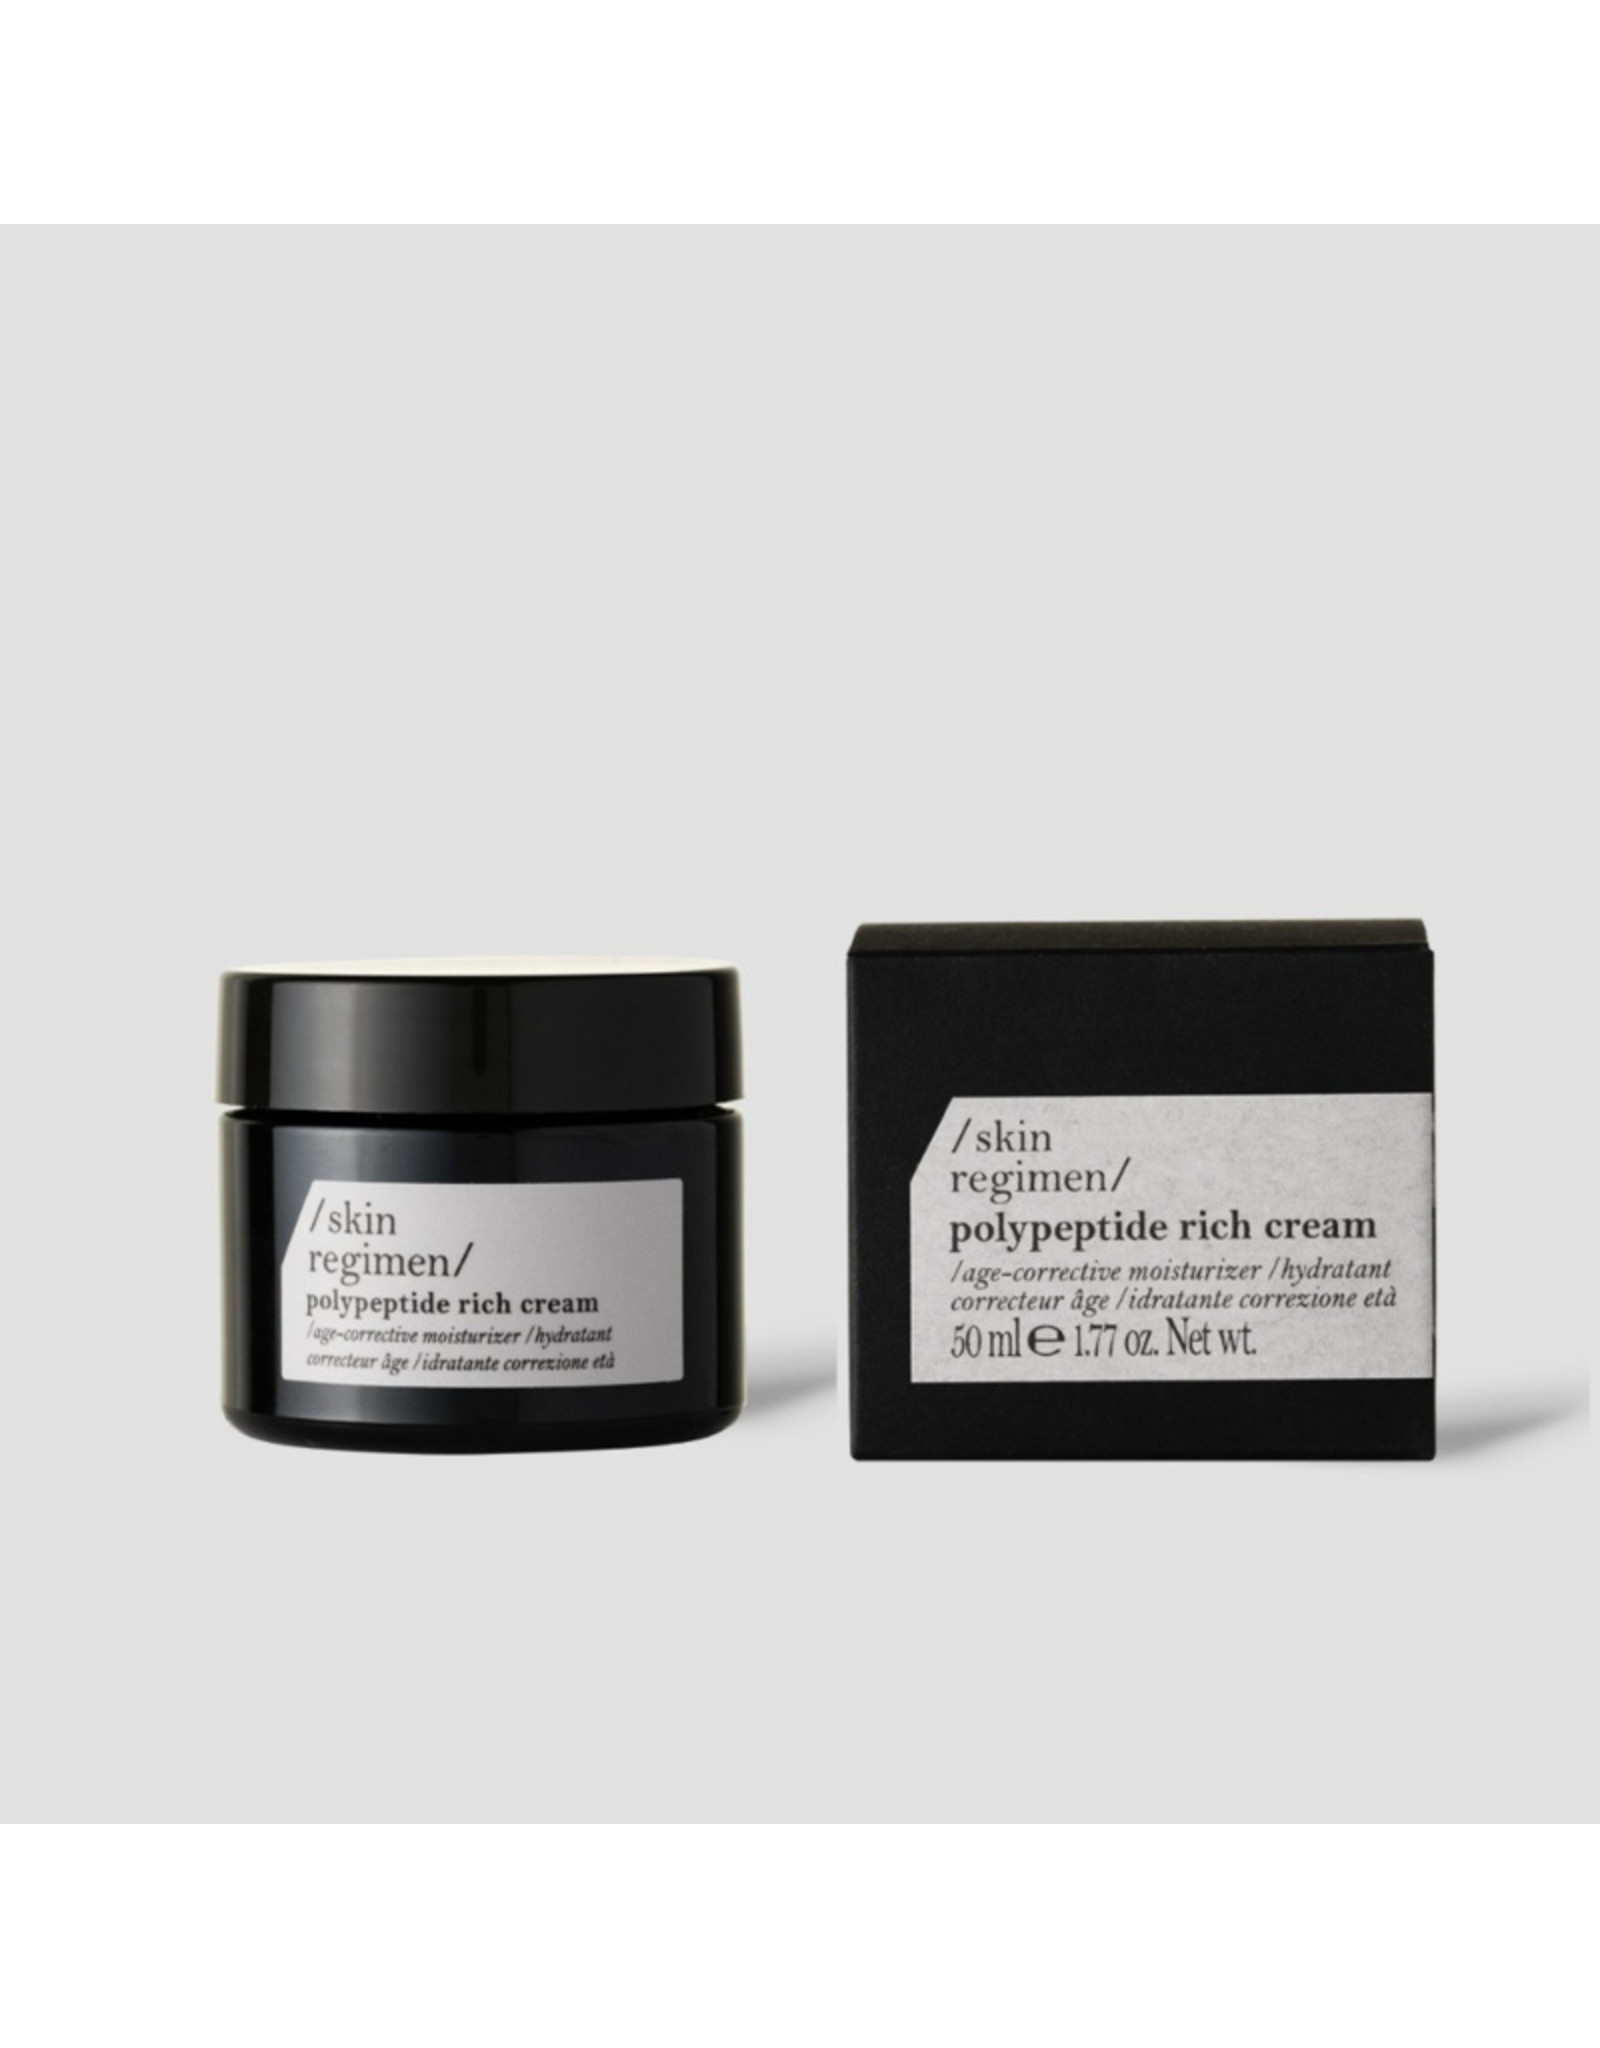 /Skin Regimen/ Polypeptide Cream 50 ml